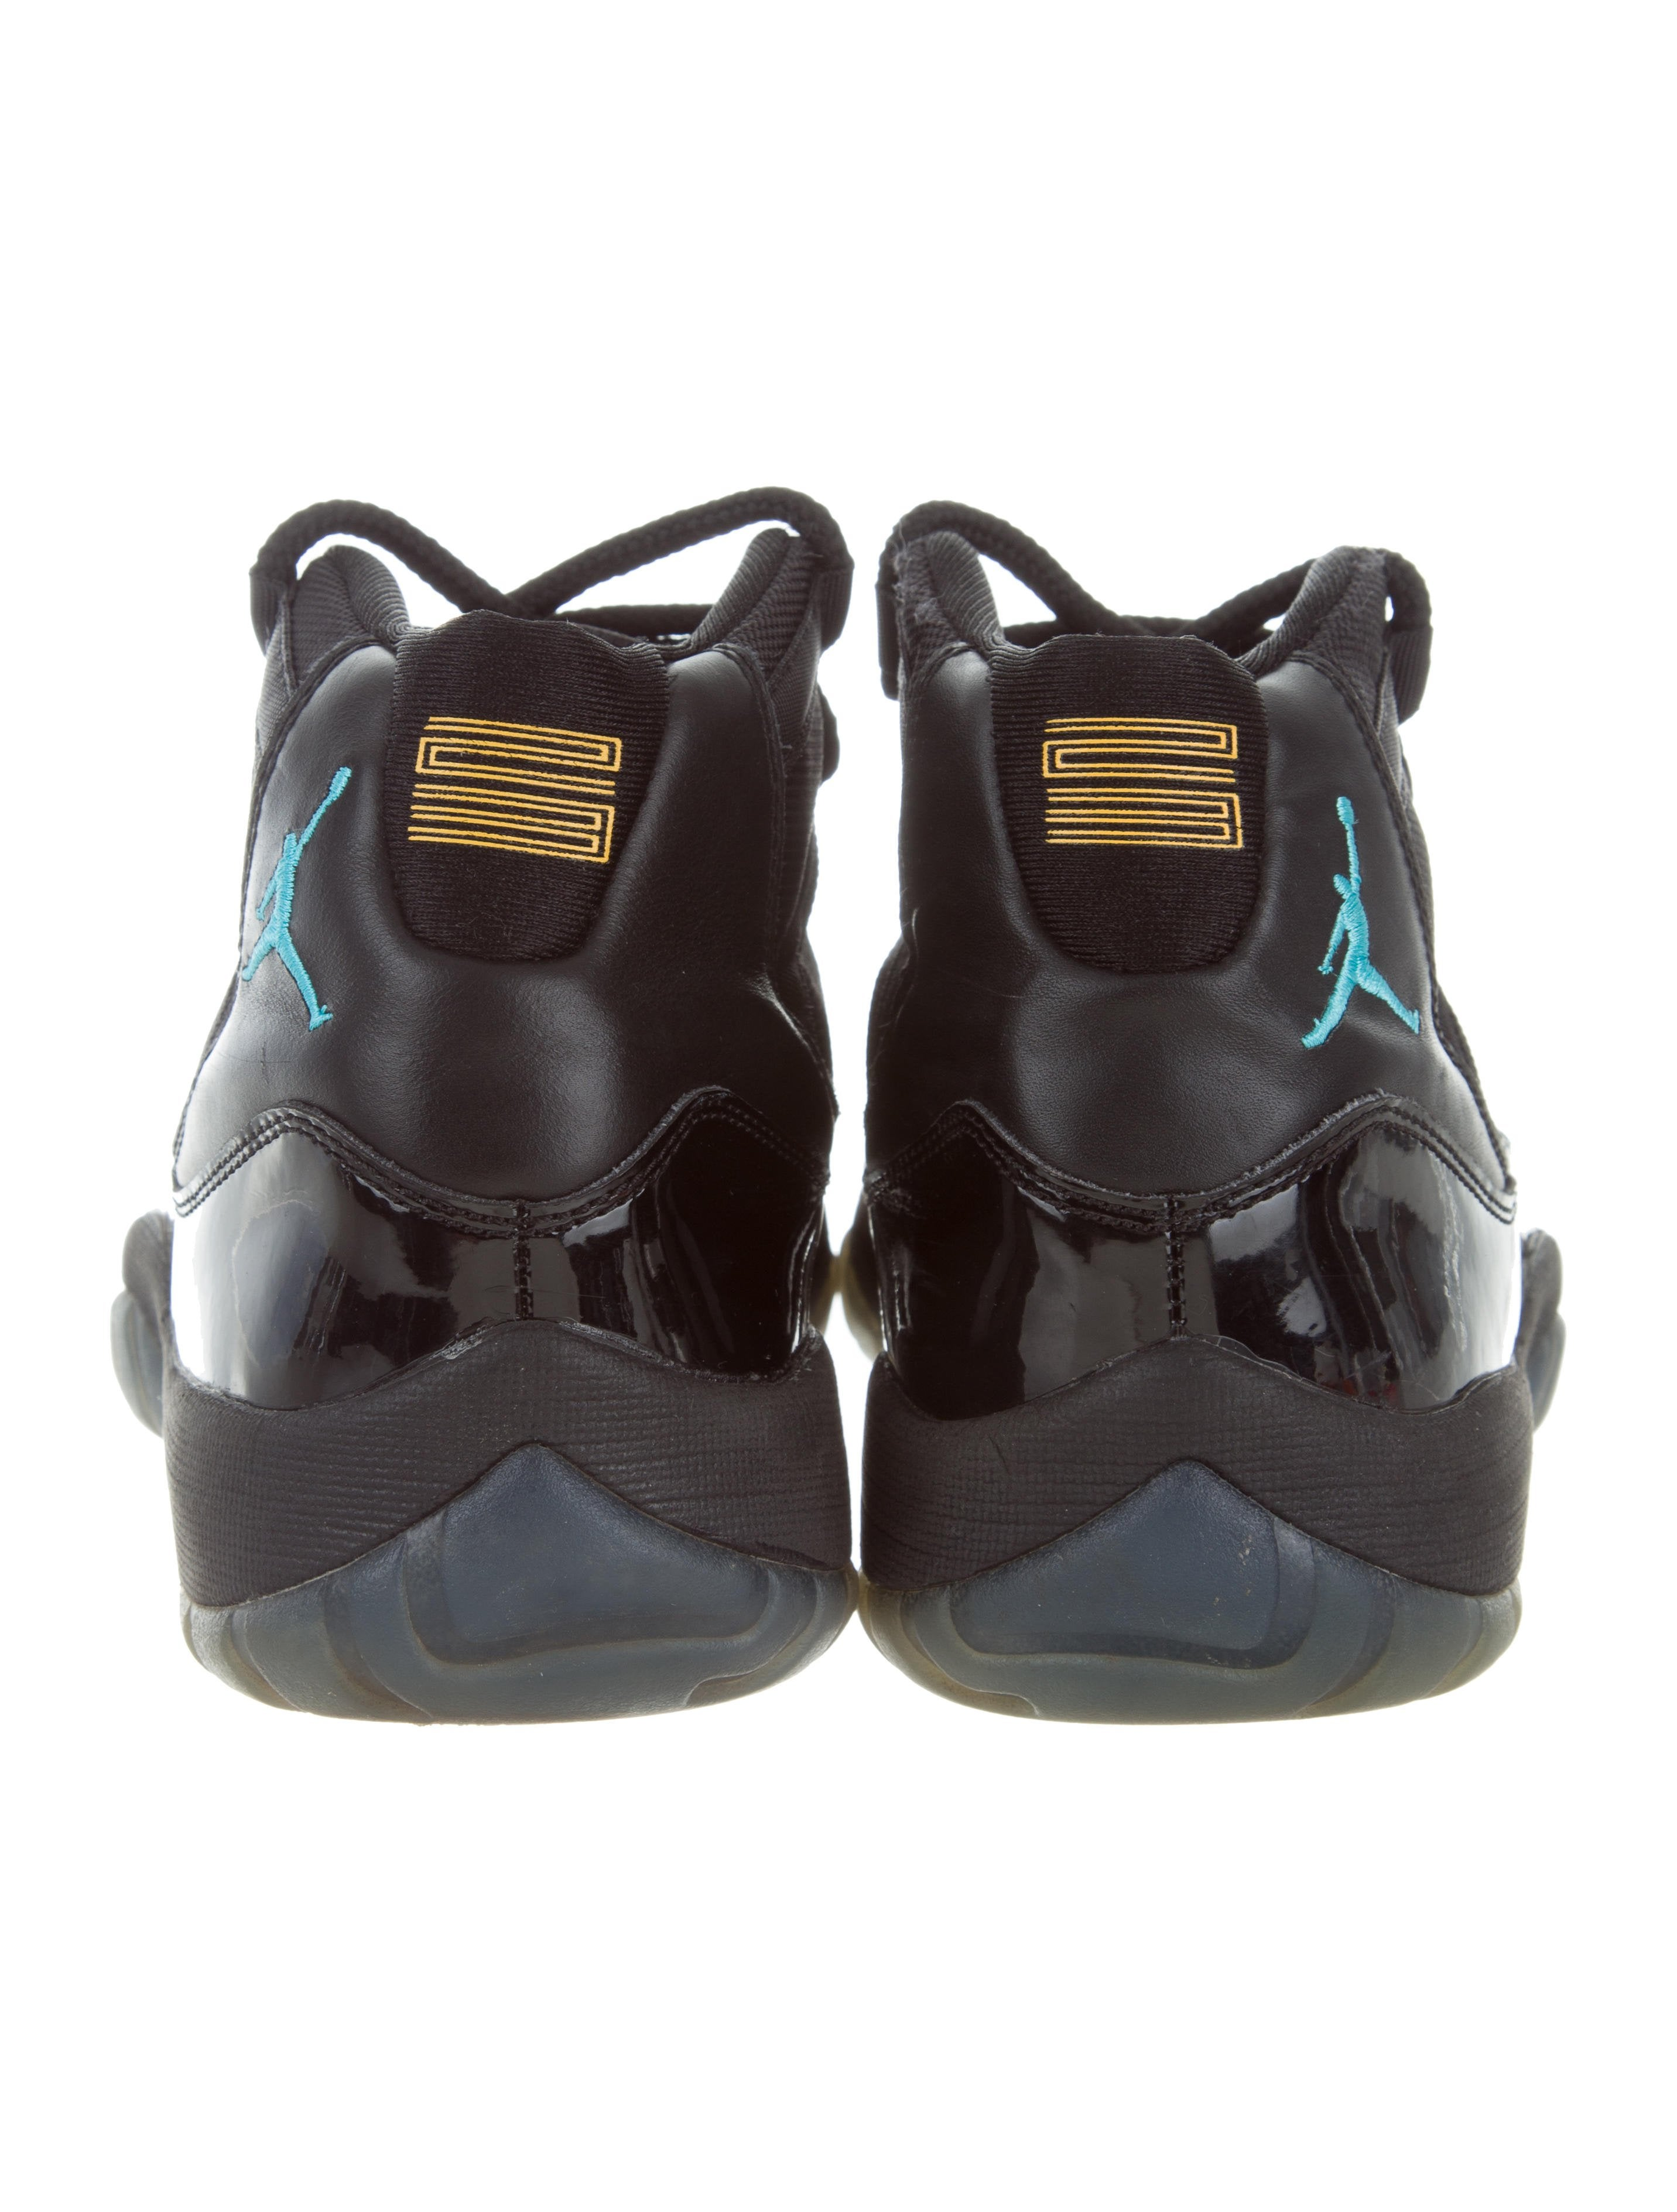 Nike Air Jordan 11 Retro Gamma Blue Sneakers Shoes Wniaj20550 The Realreal